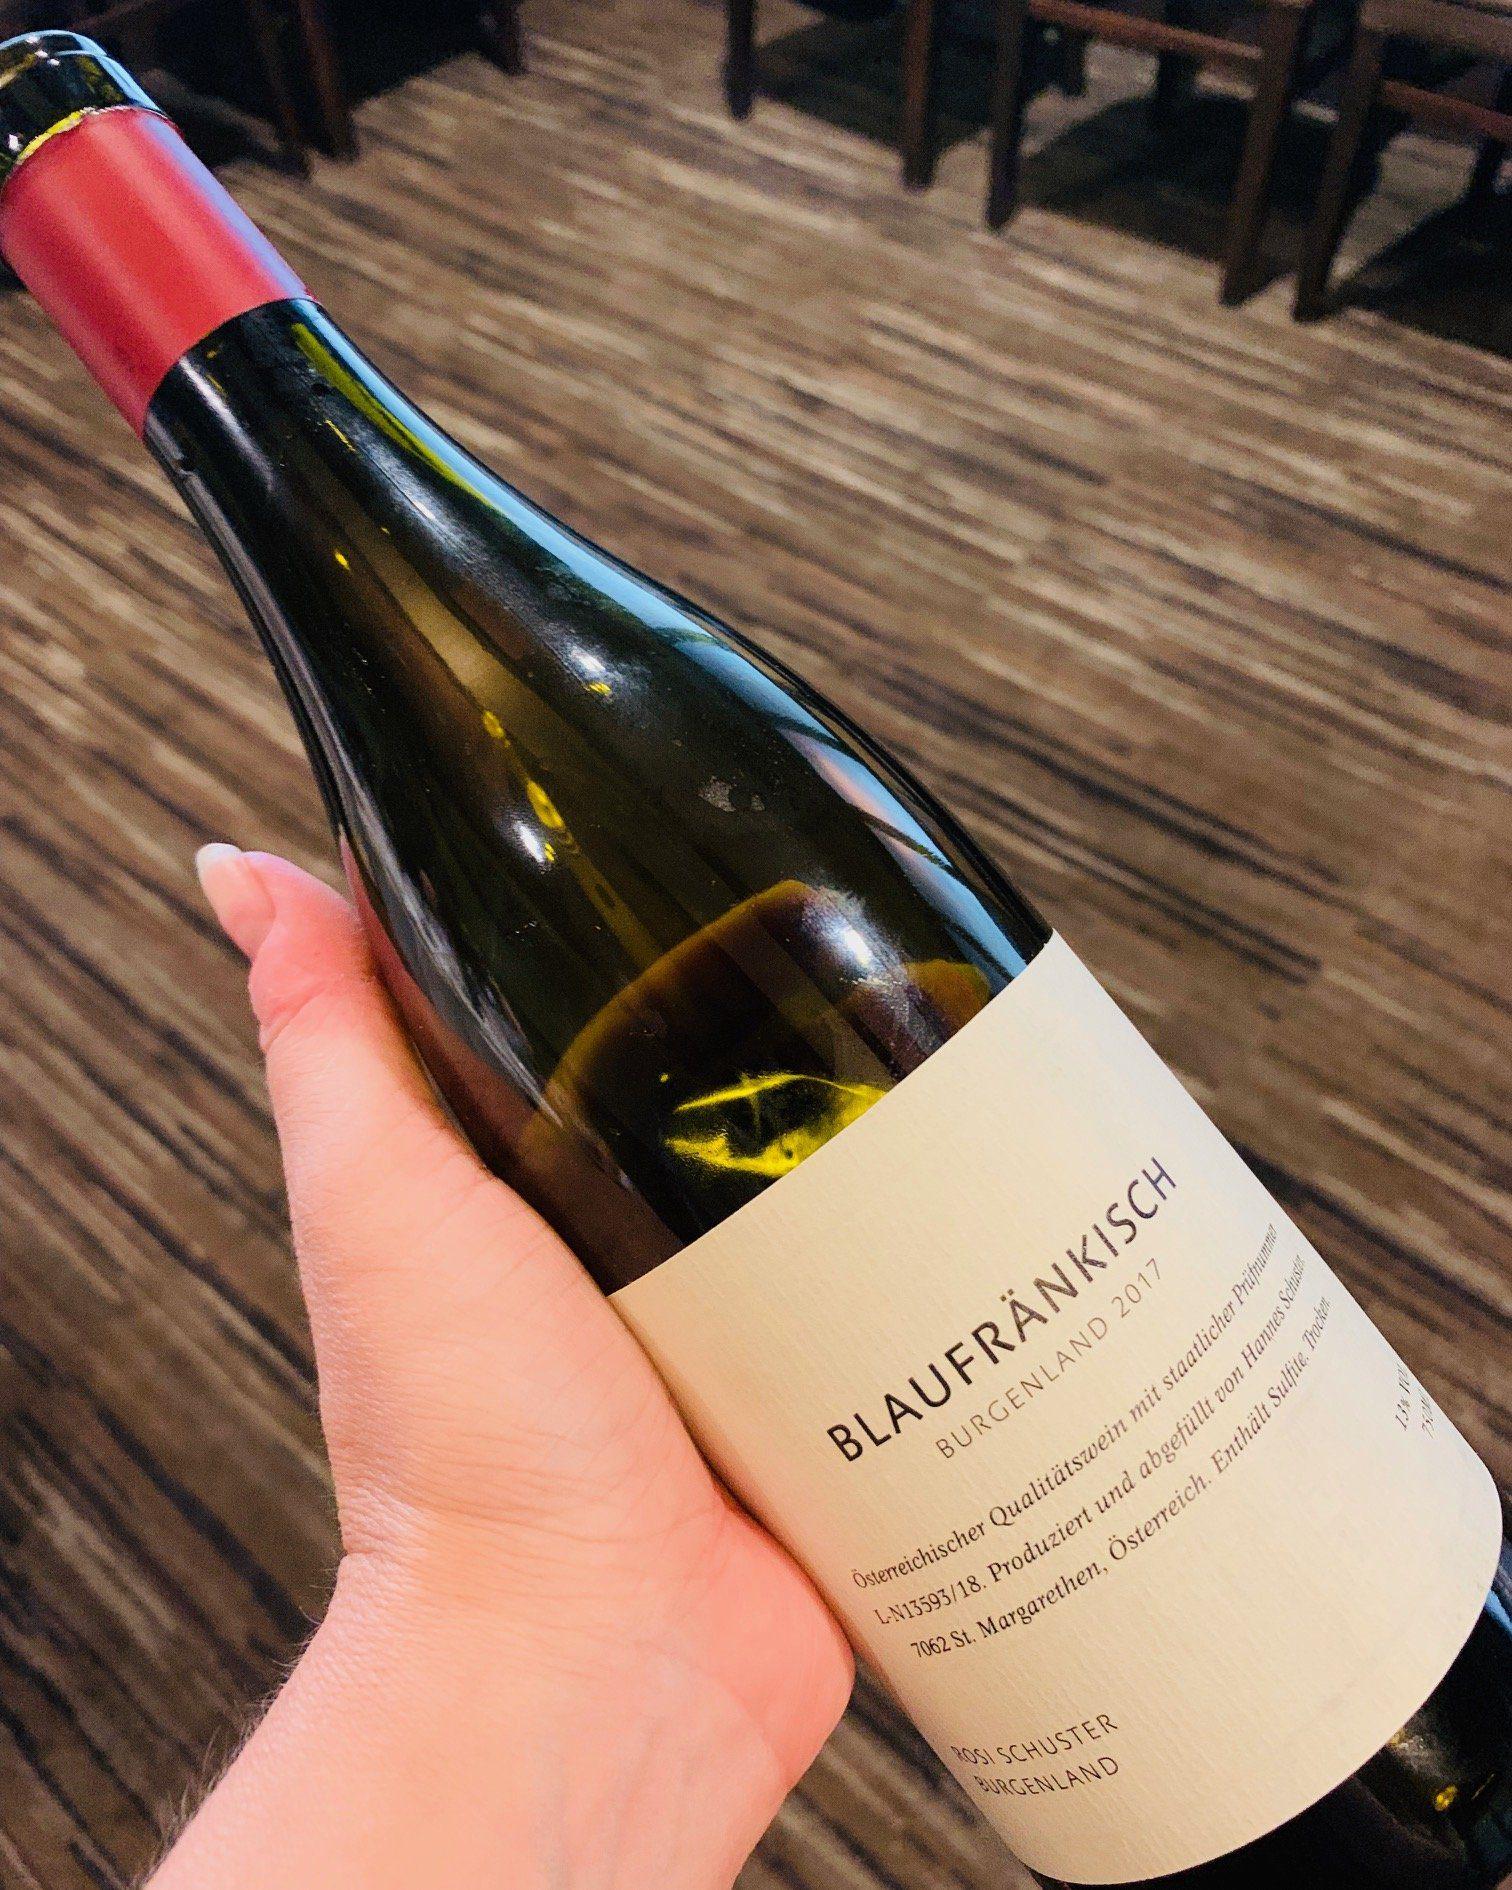 food and wine pairings Rosi Schuster Blaufränkisch 2017